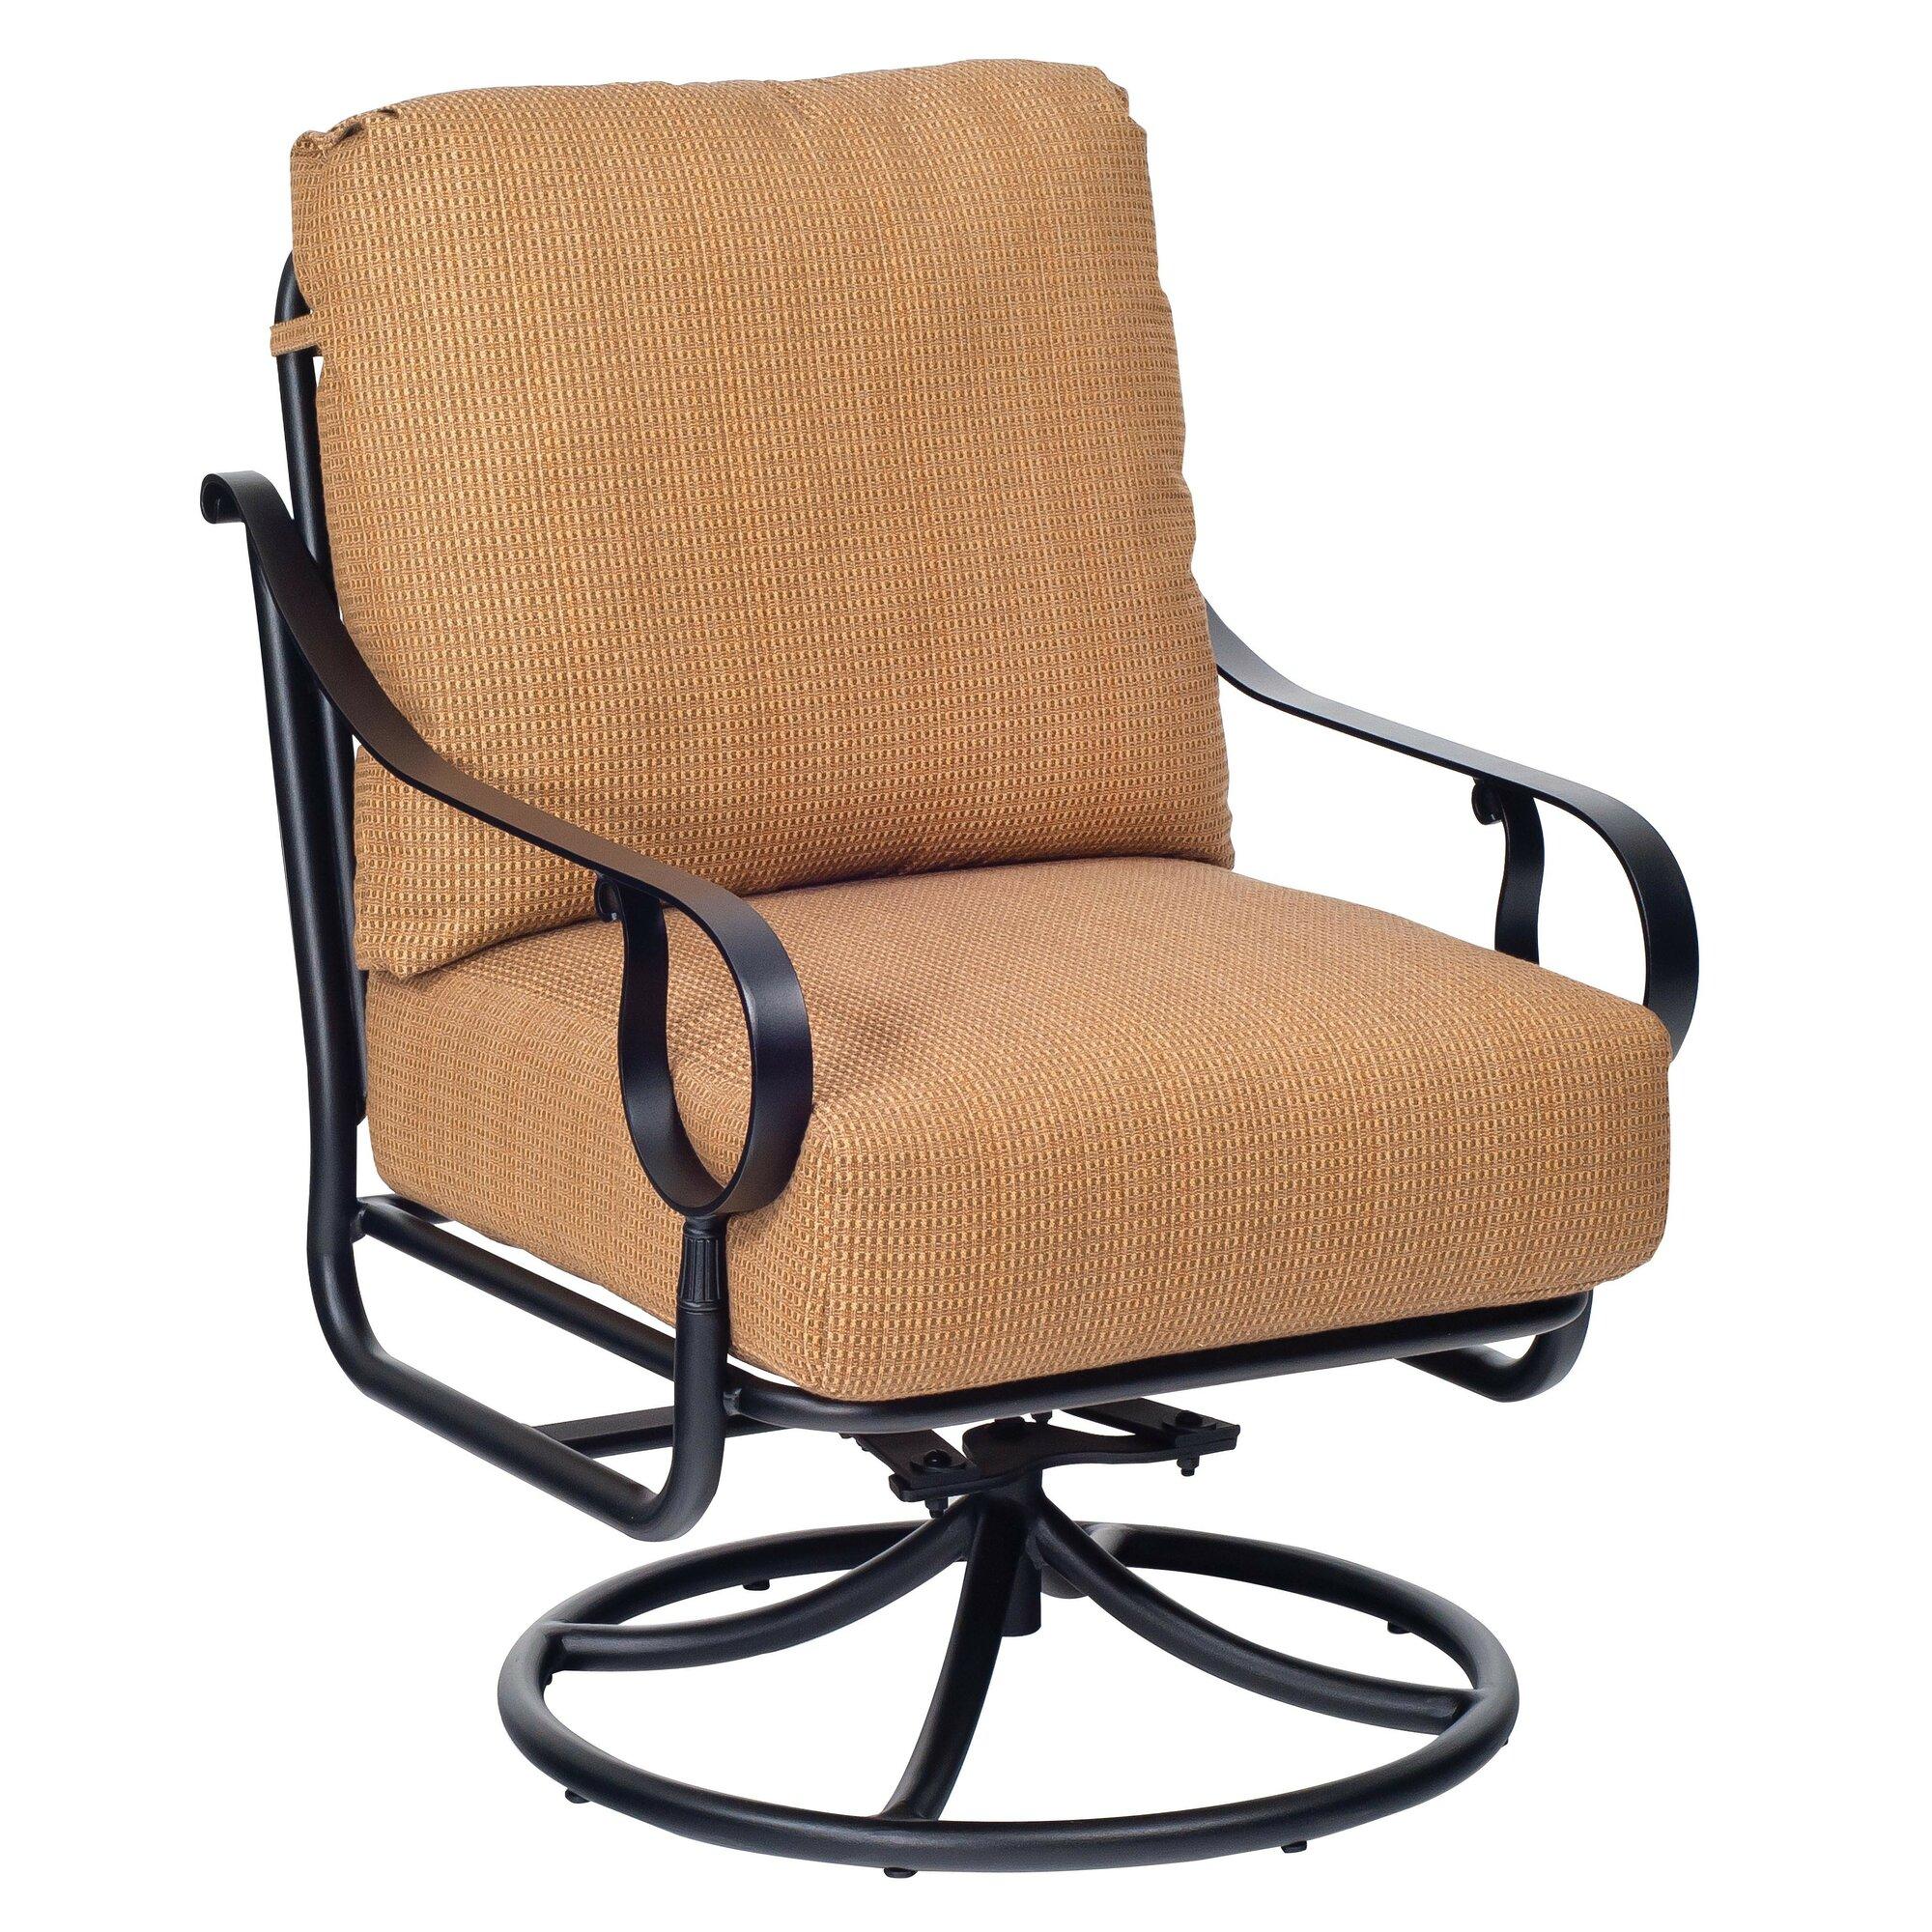 Woodard Ridgecrest Swivel Rocking Lounge Chair  Wayfair.ca